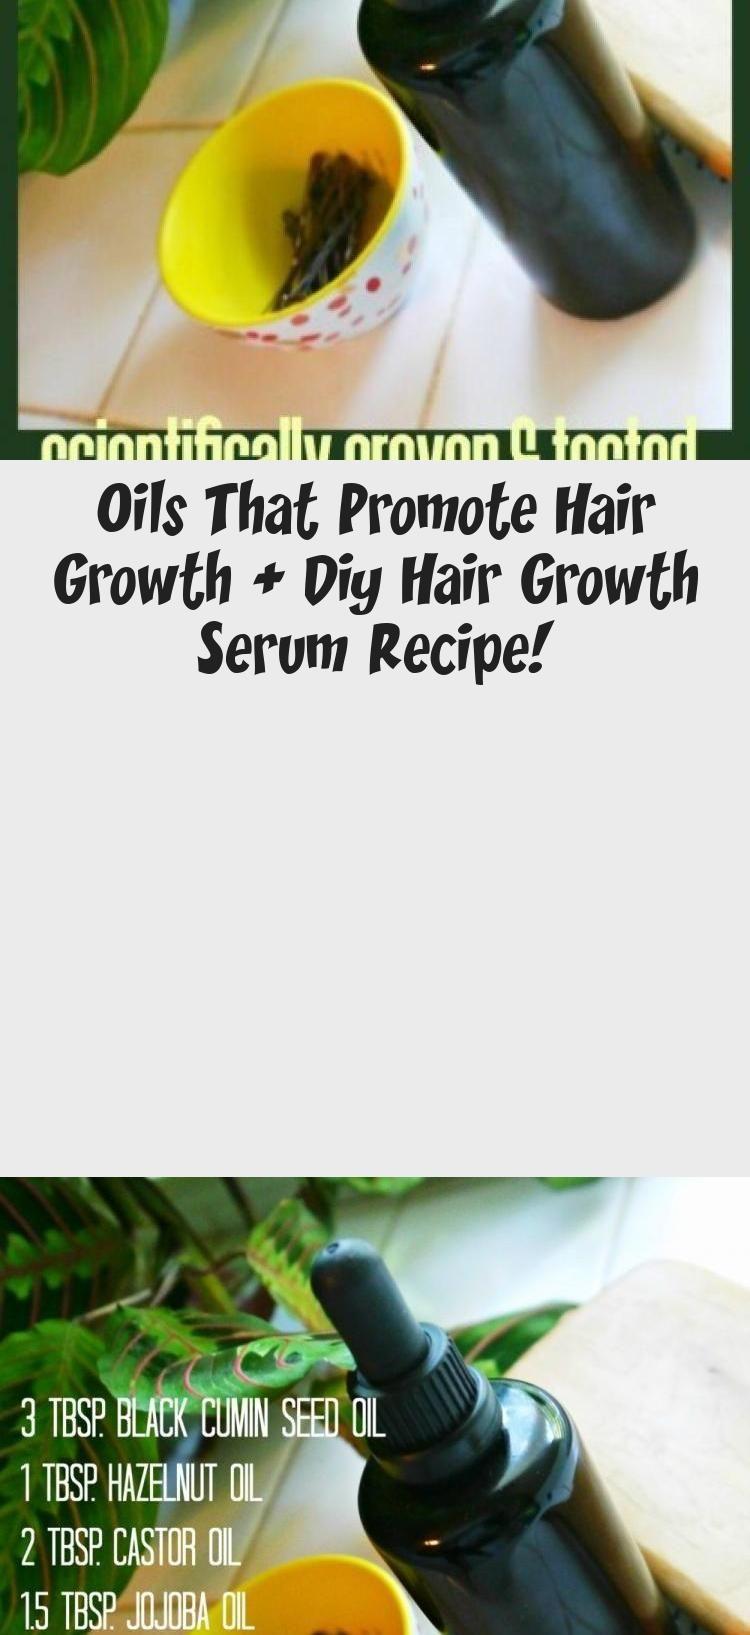 Oils That Promote Hair Growth + Diy Hair Growth Serum Recipe! #fasterhairgrowth